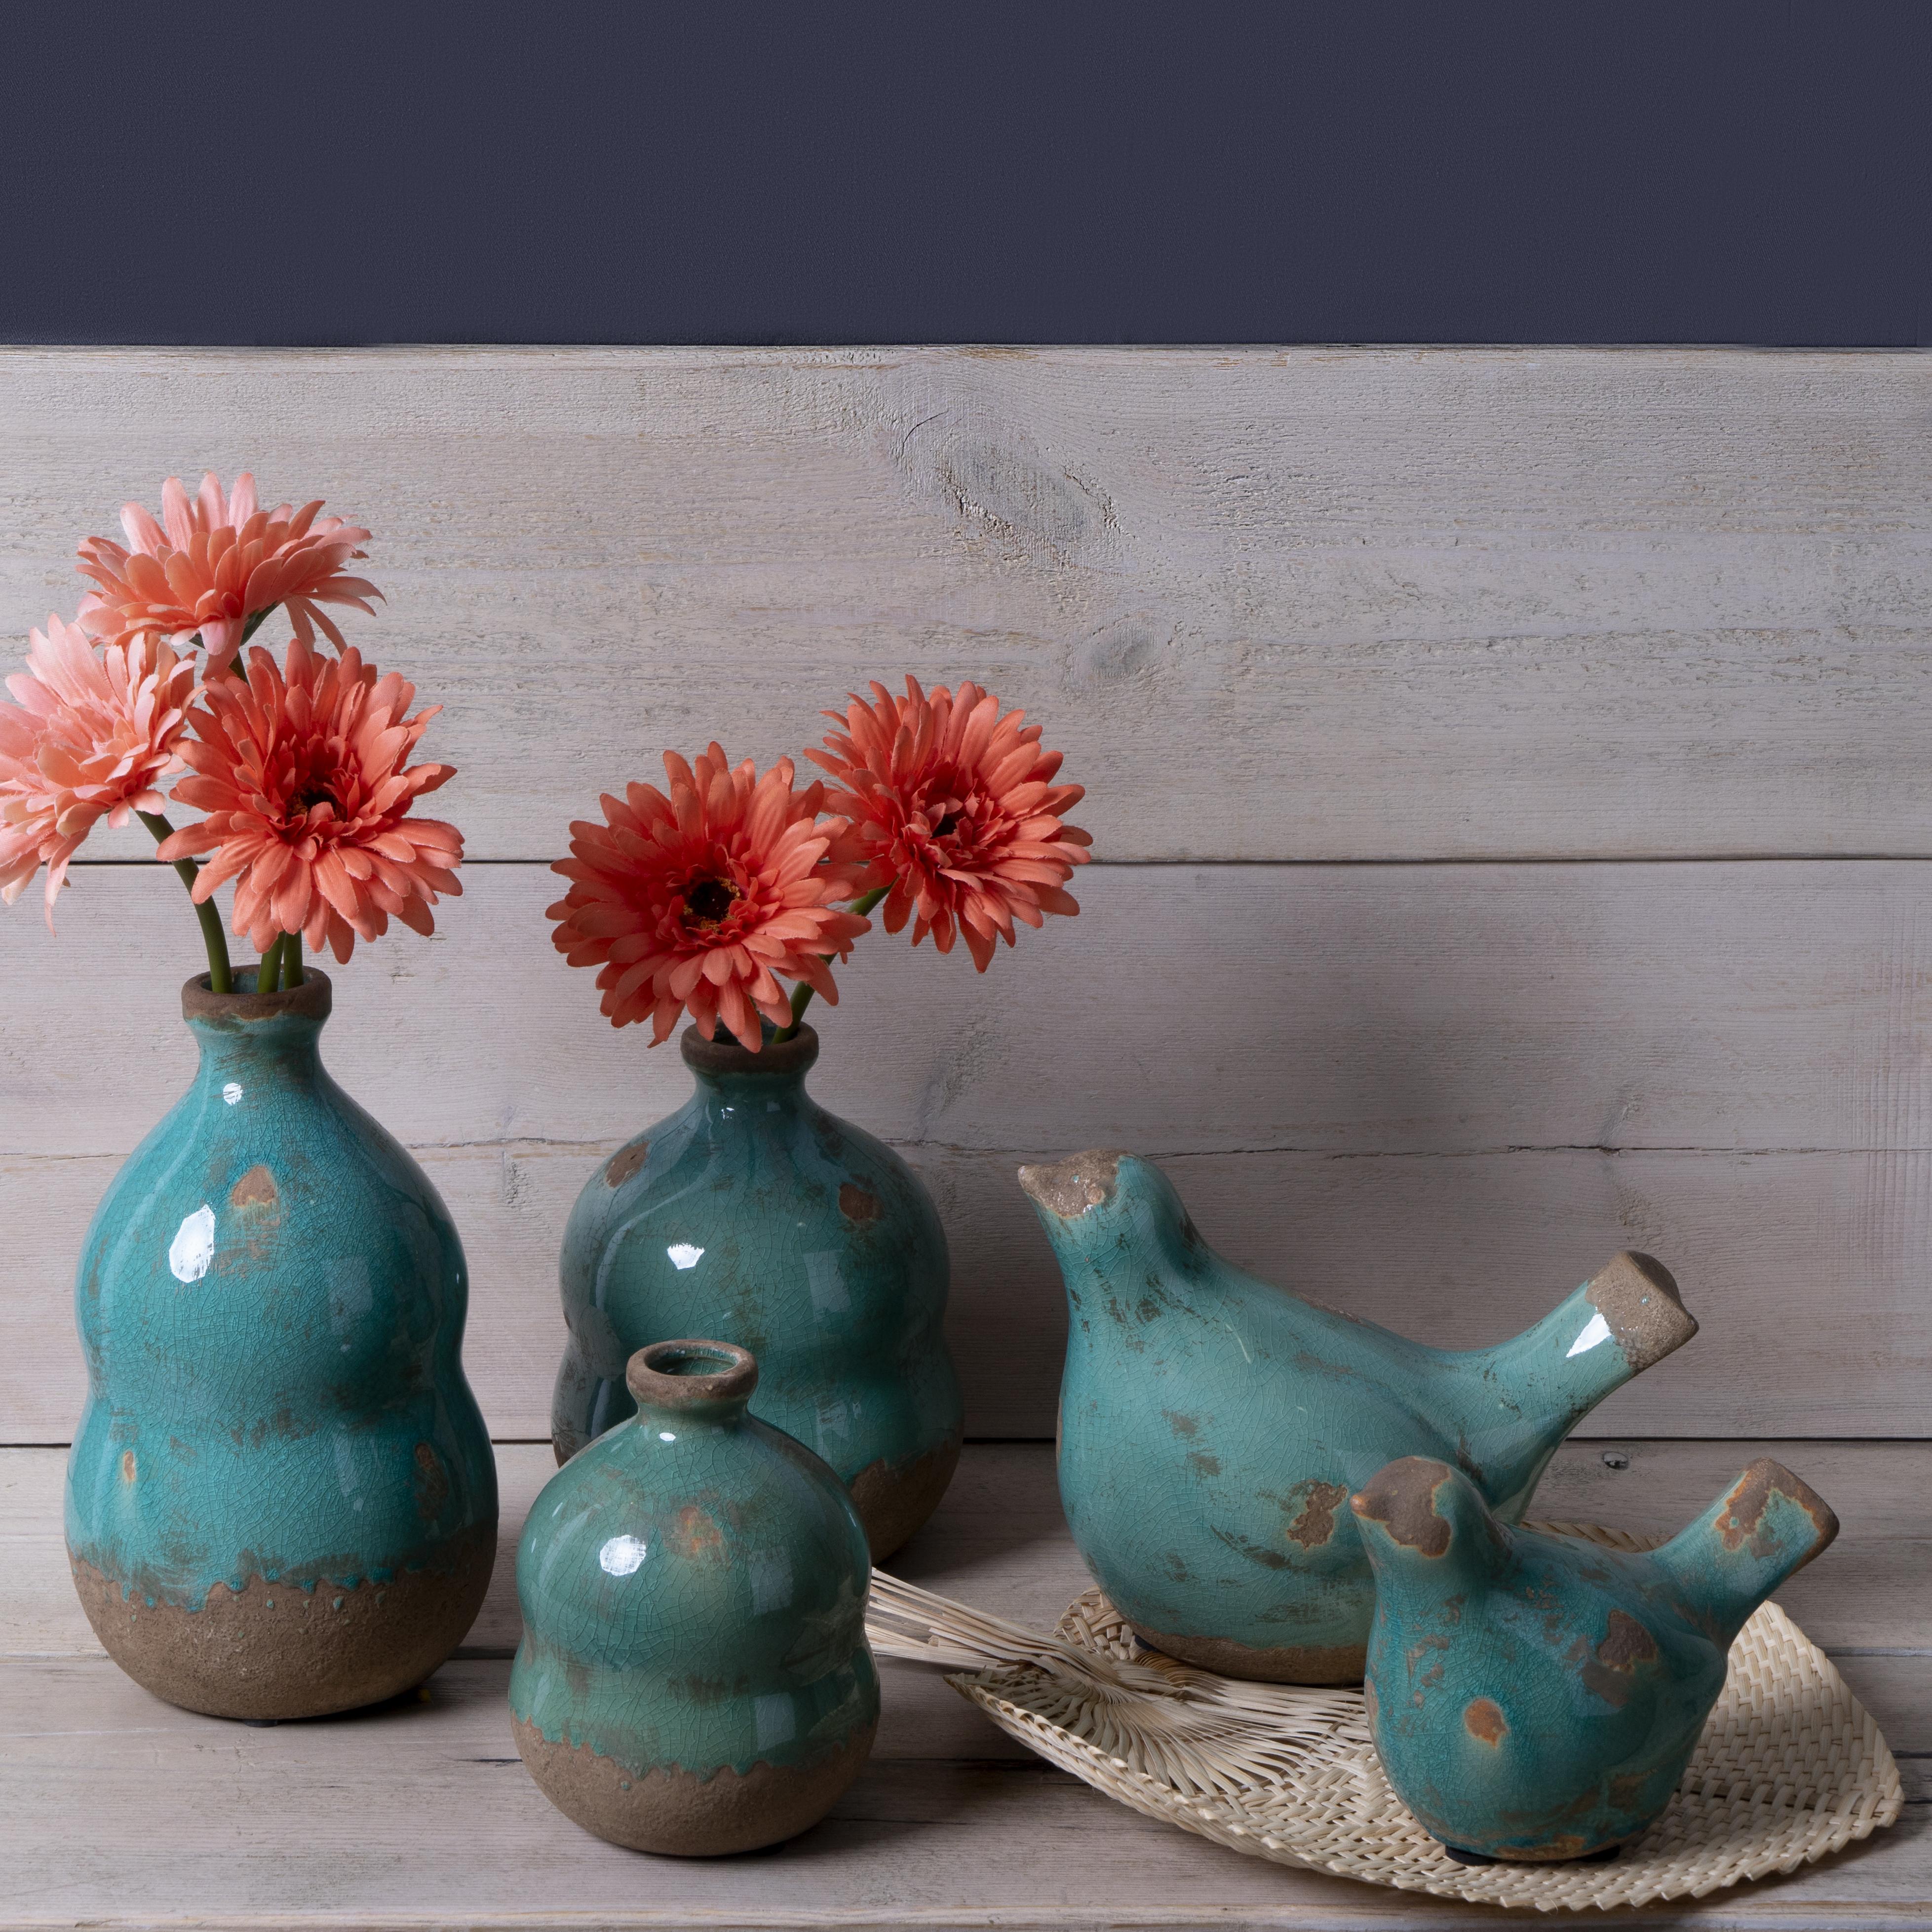 igura Decorativa Pájaro Cerámica Decorativo Color Turquesa – Moderno Vintage para Hogar Oficina Sala